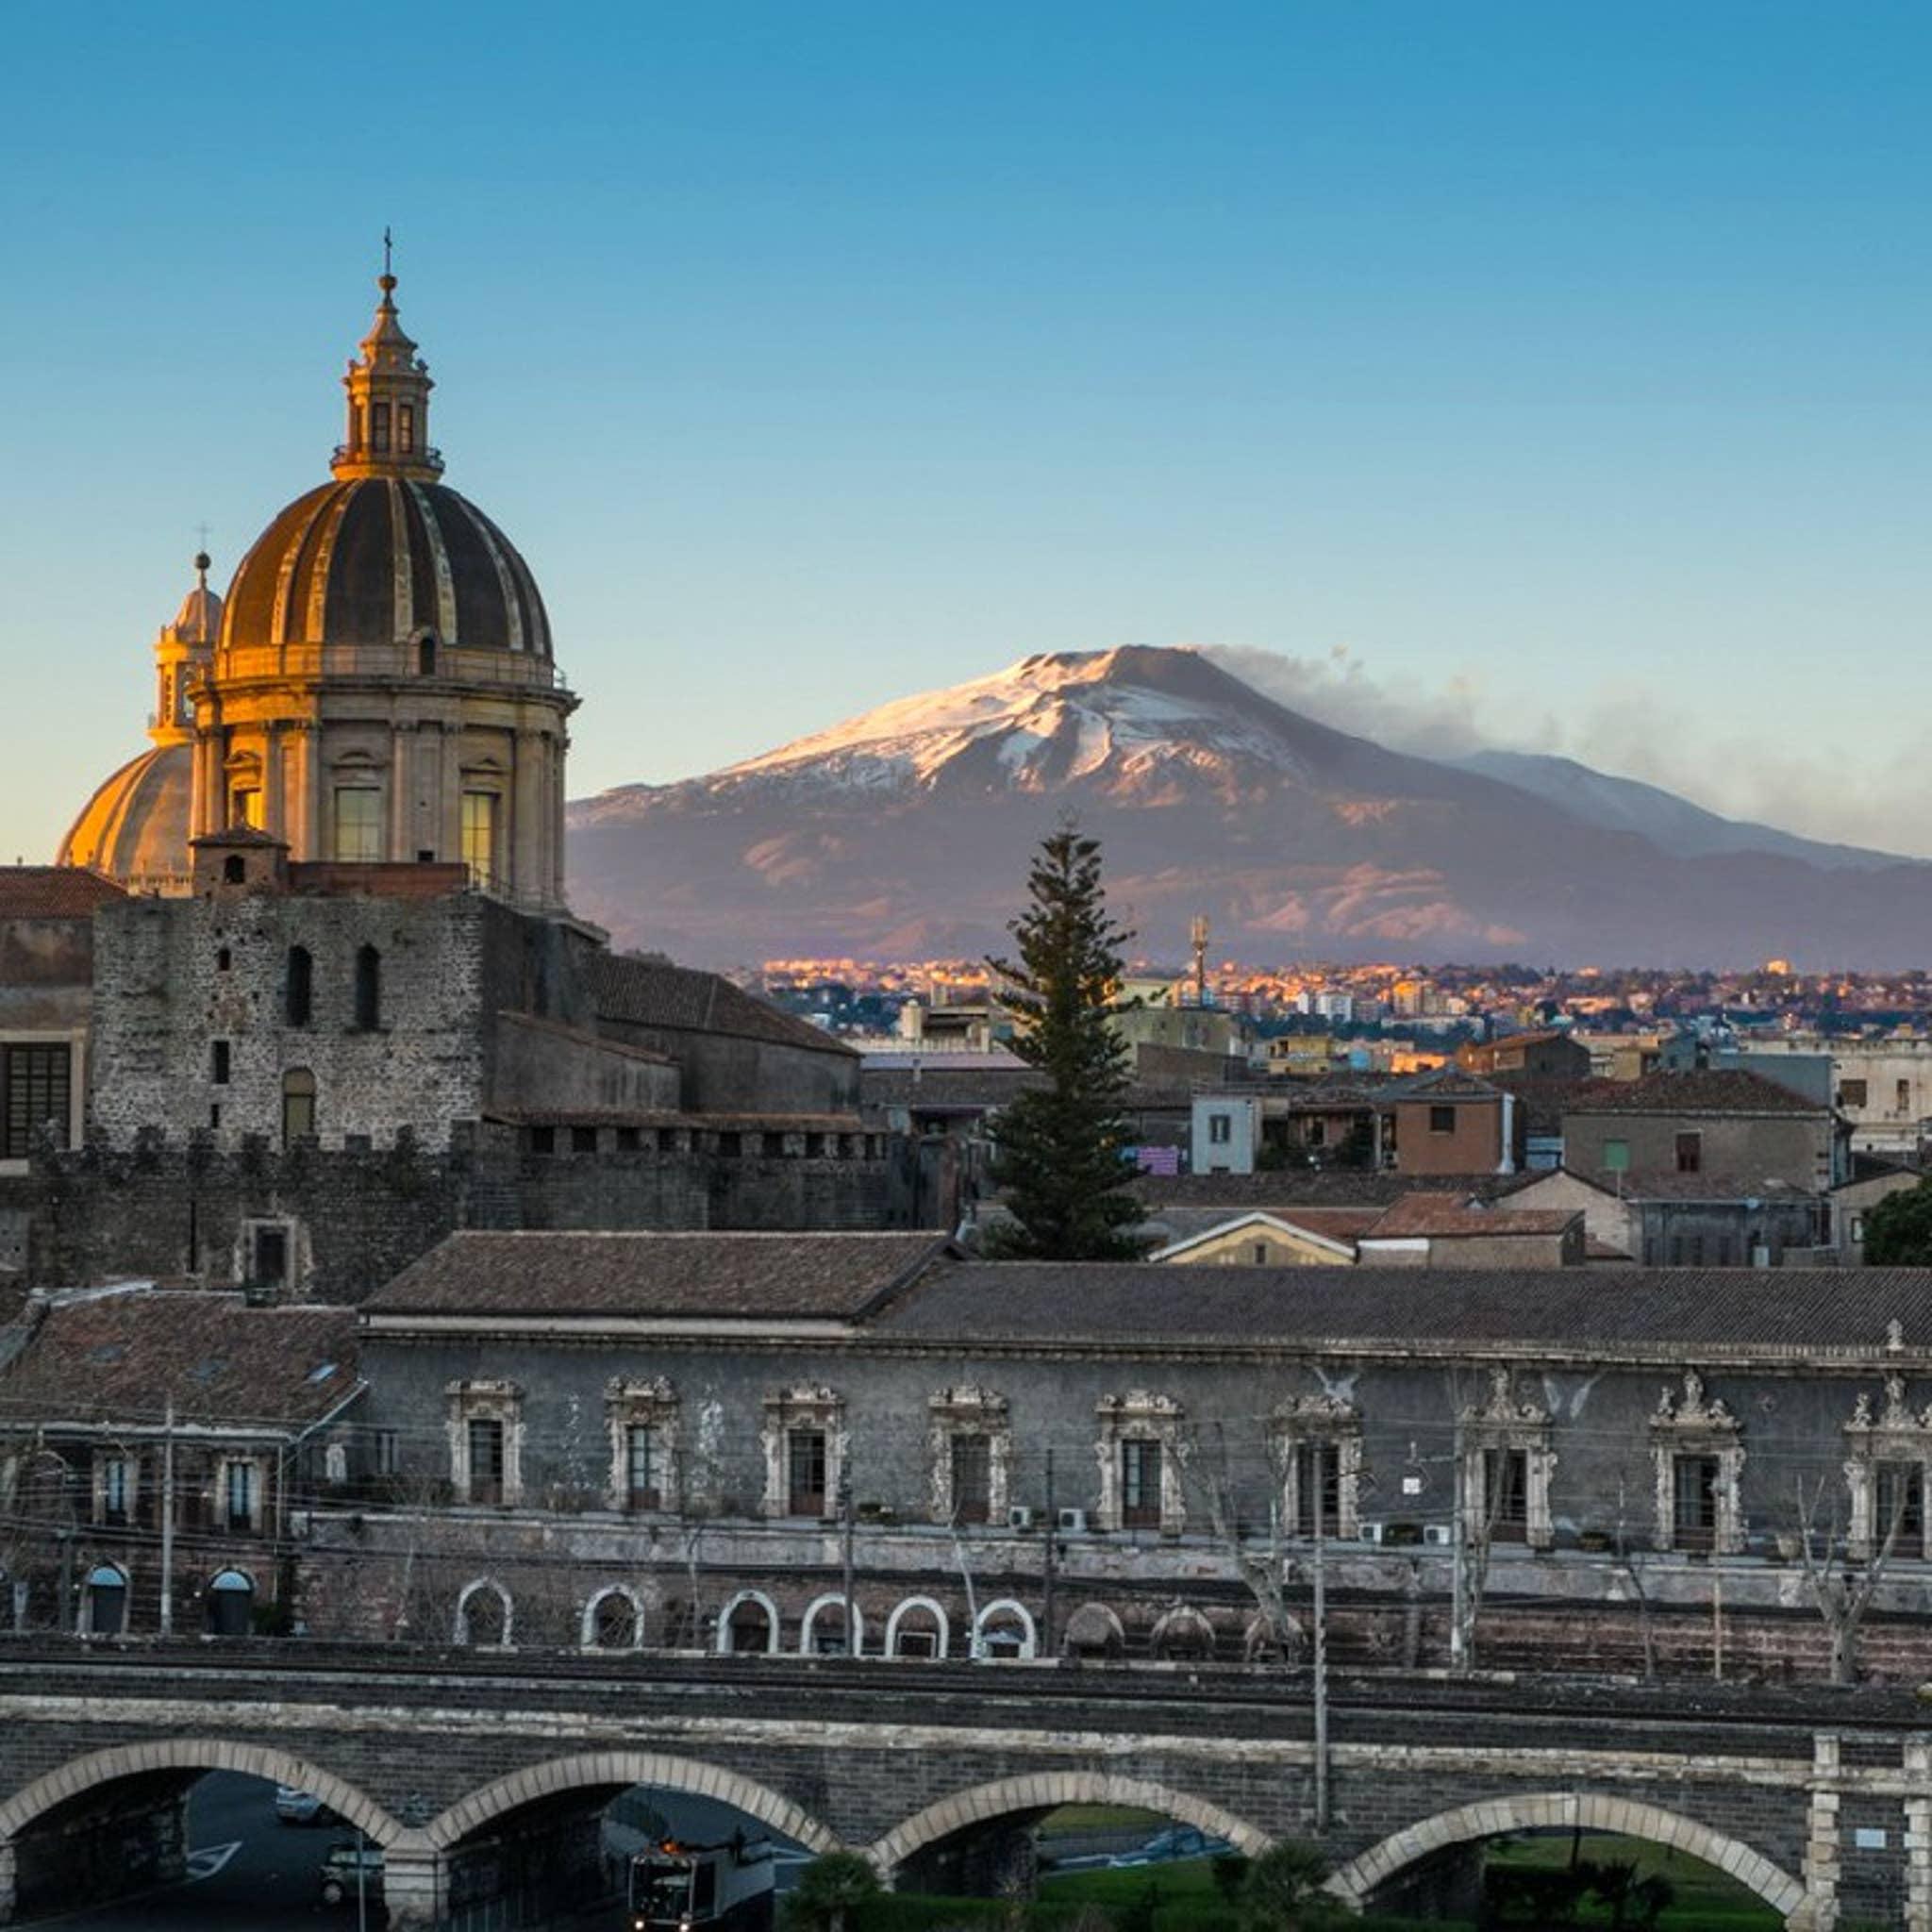 Maison de vacances  (2782175), Catania, Catania, Sicile, Italie, image 31